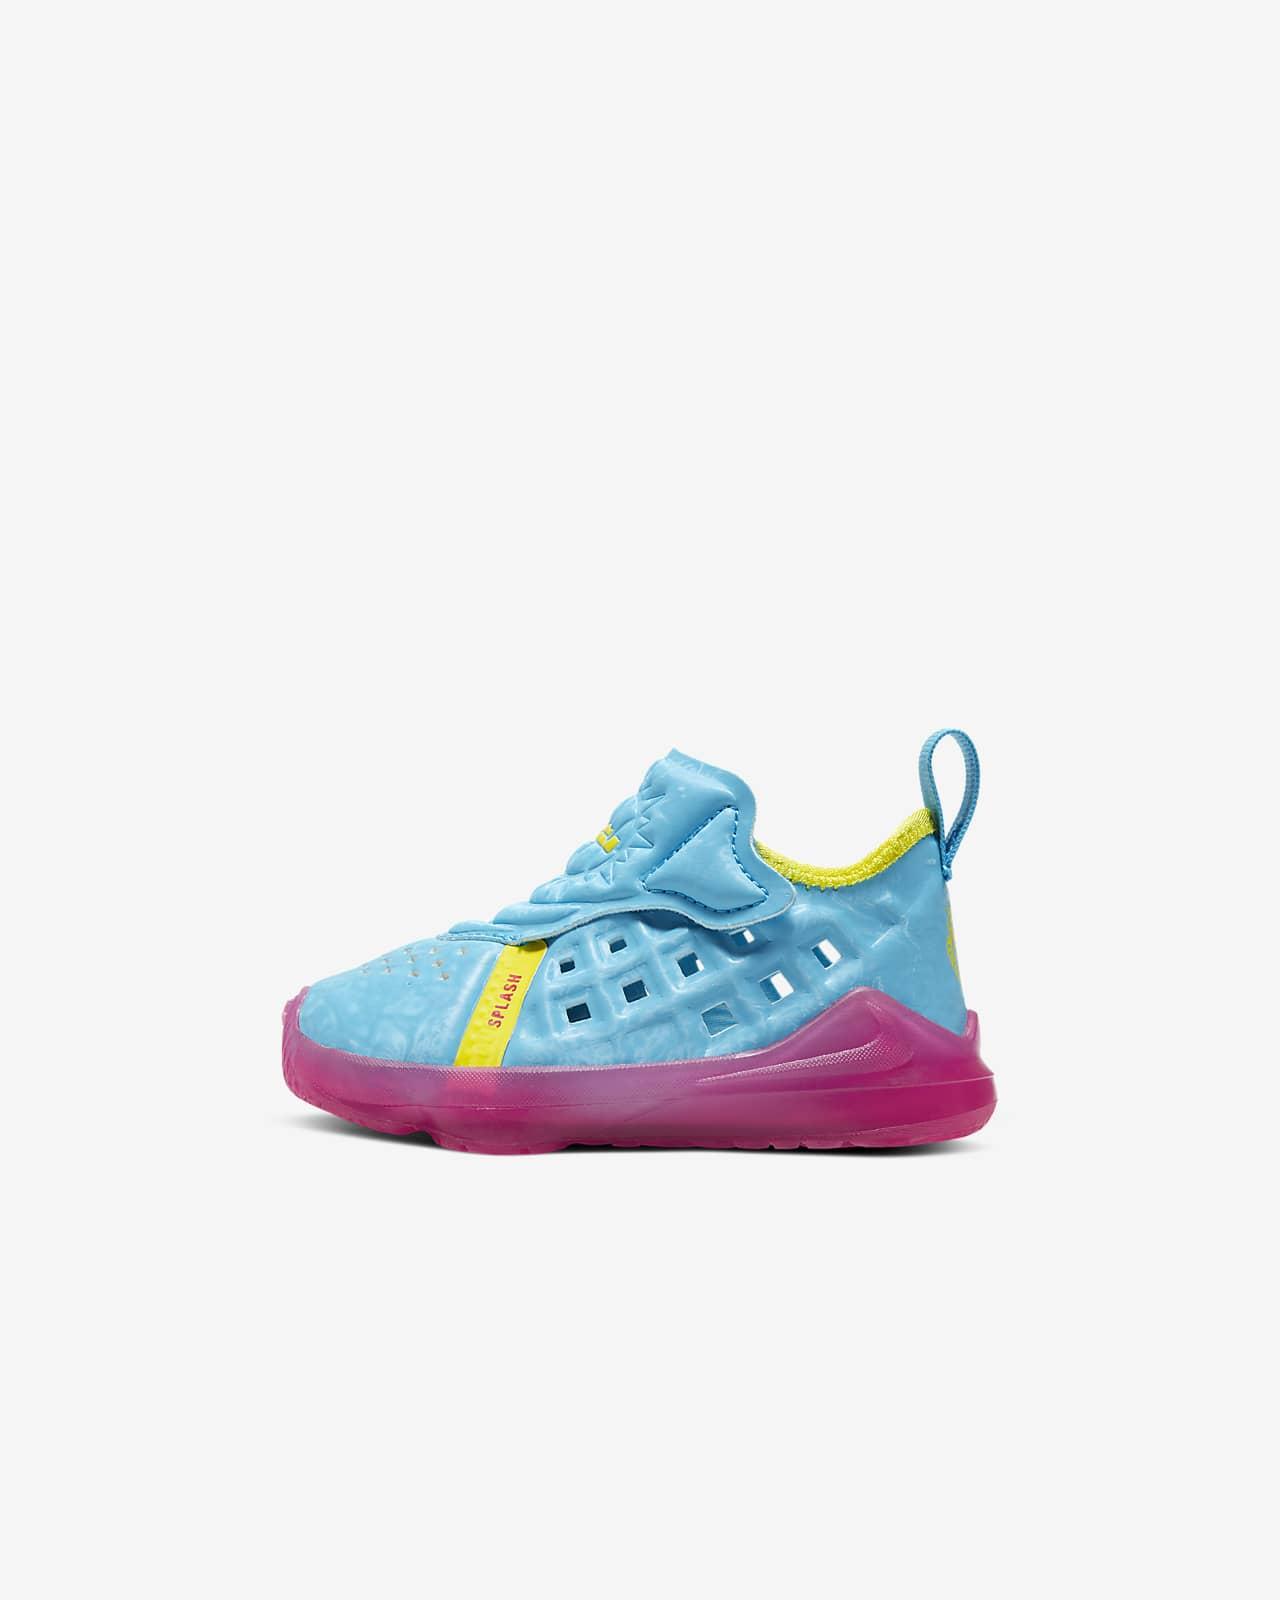 Lebron 17 Dunked Baby/Toddler Shoe